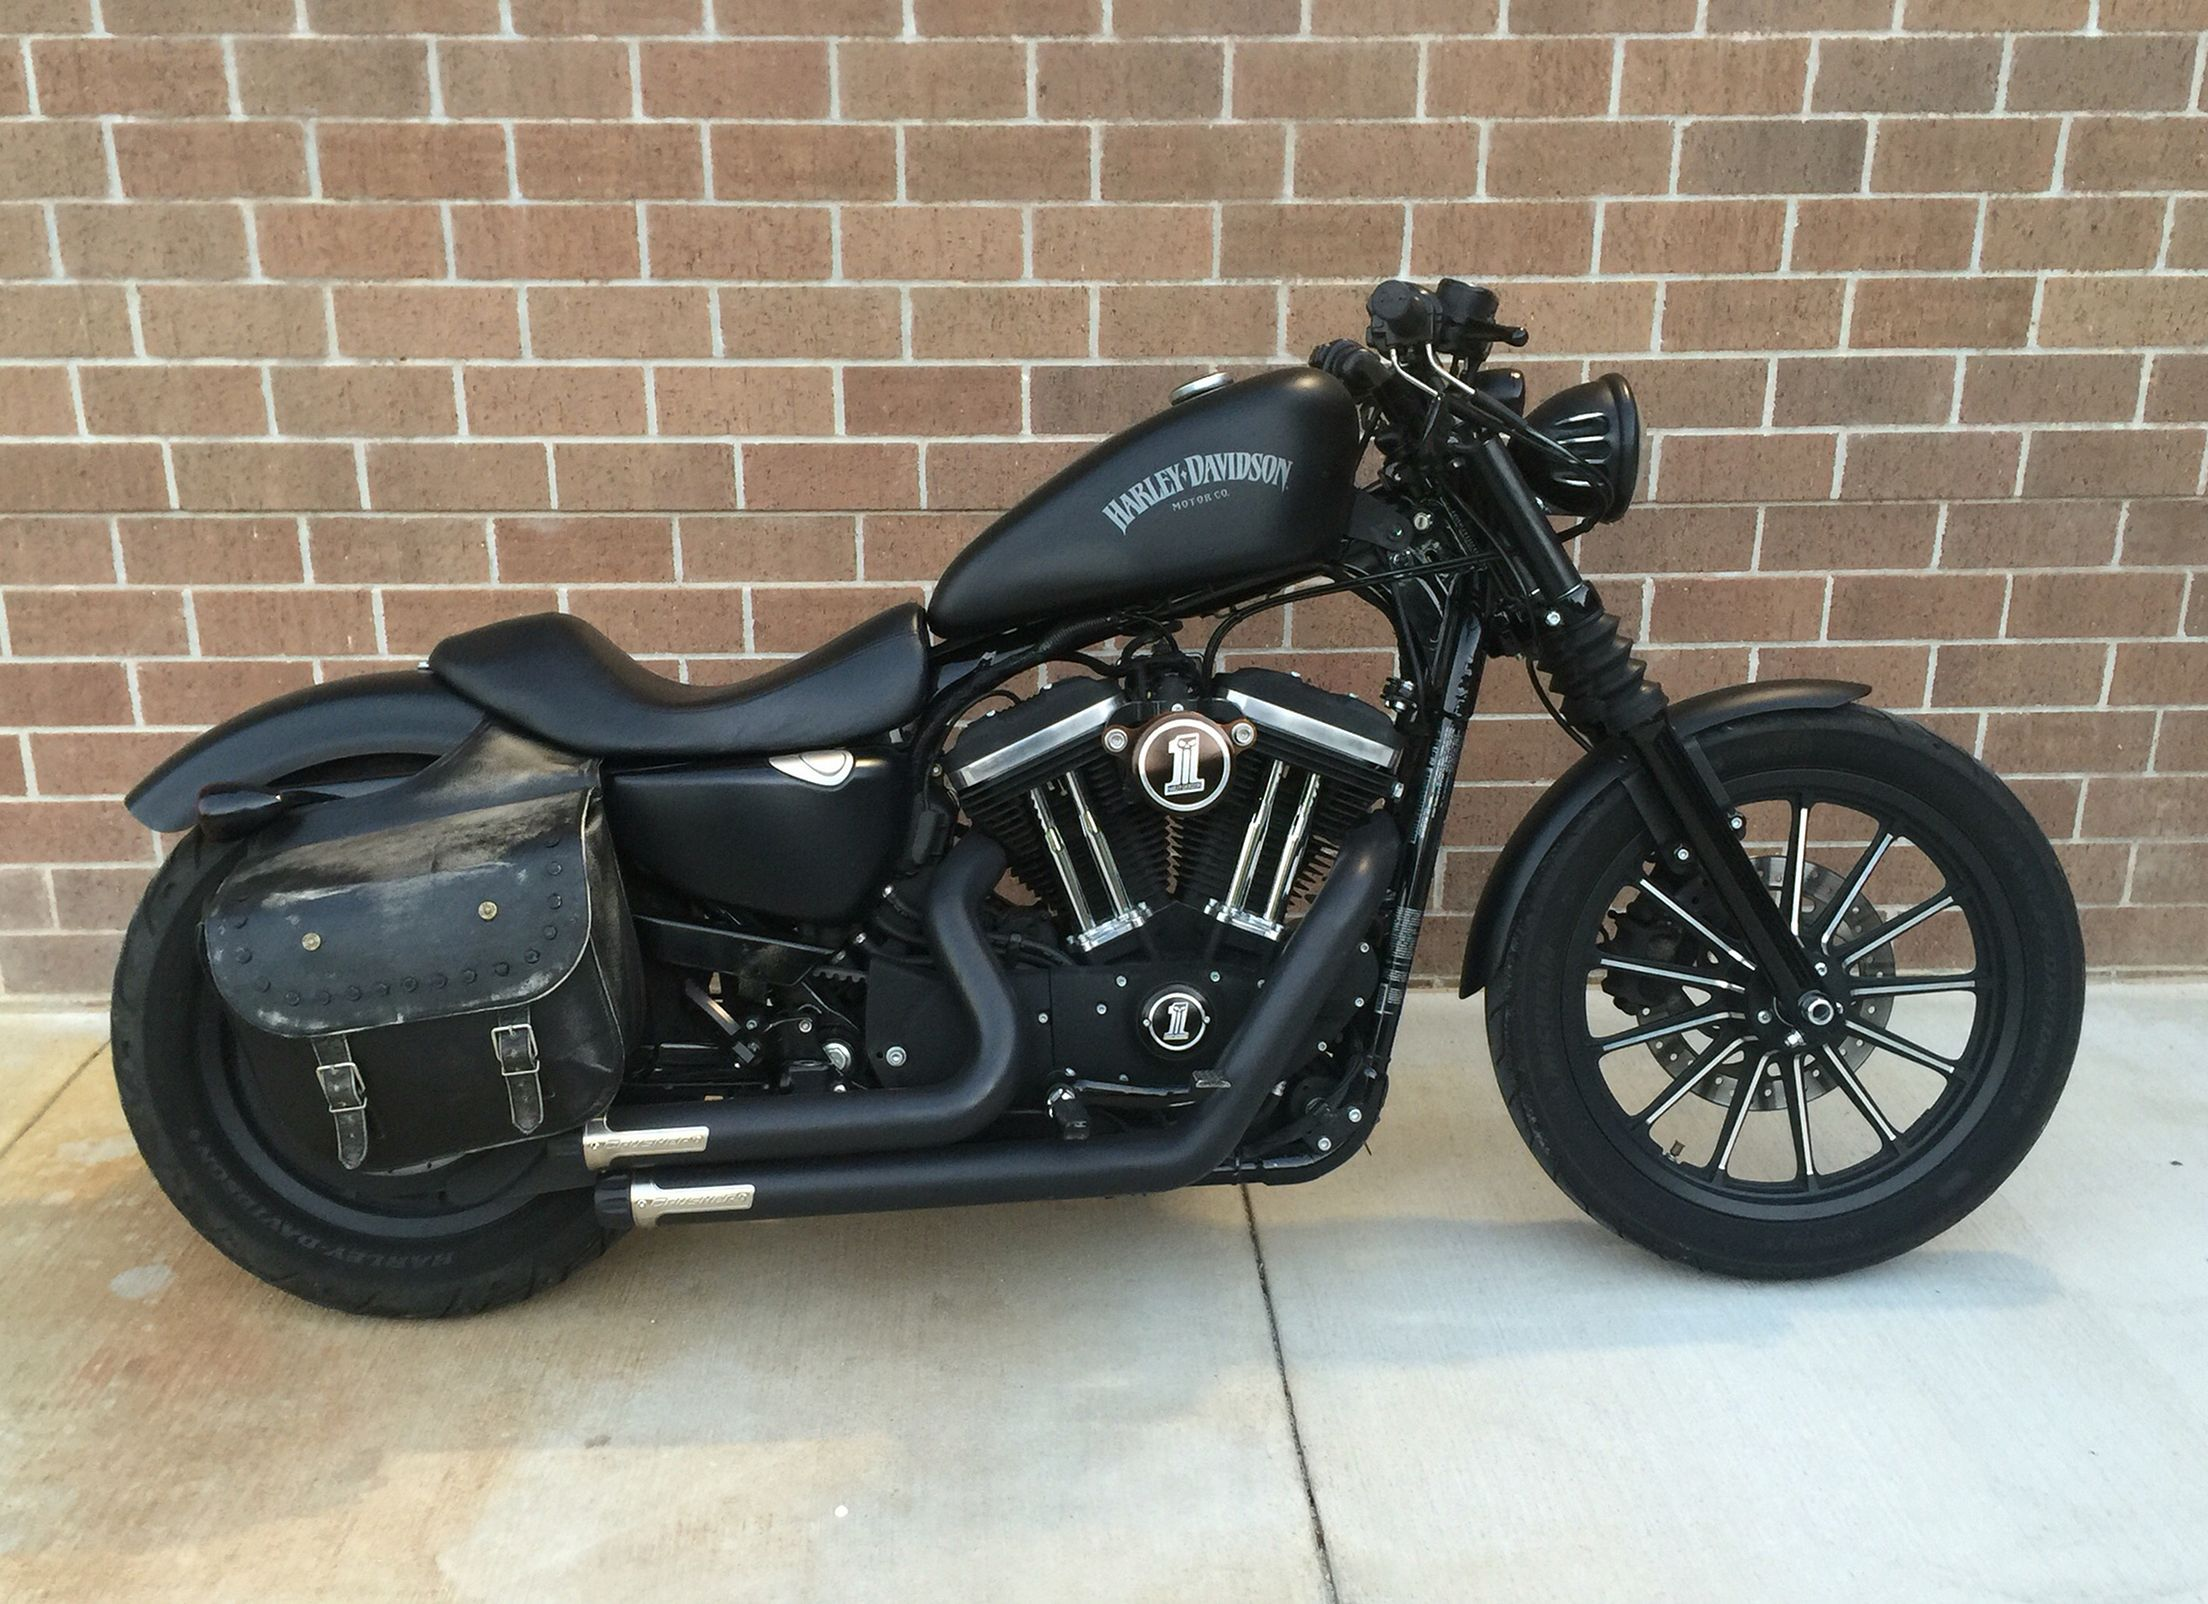 Pin By Art G On Rides Harley Davidson Iron 883 Motorcycle Harley Harley Davidson Bikes